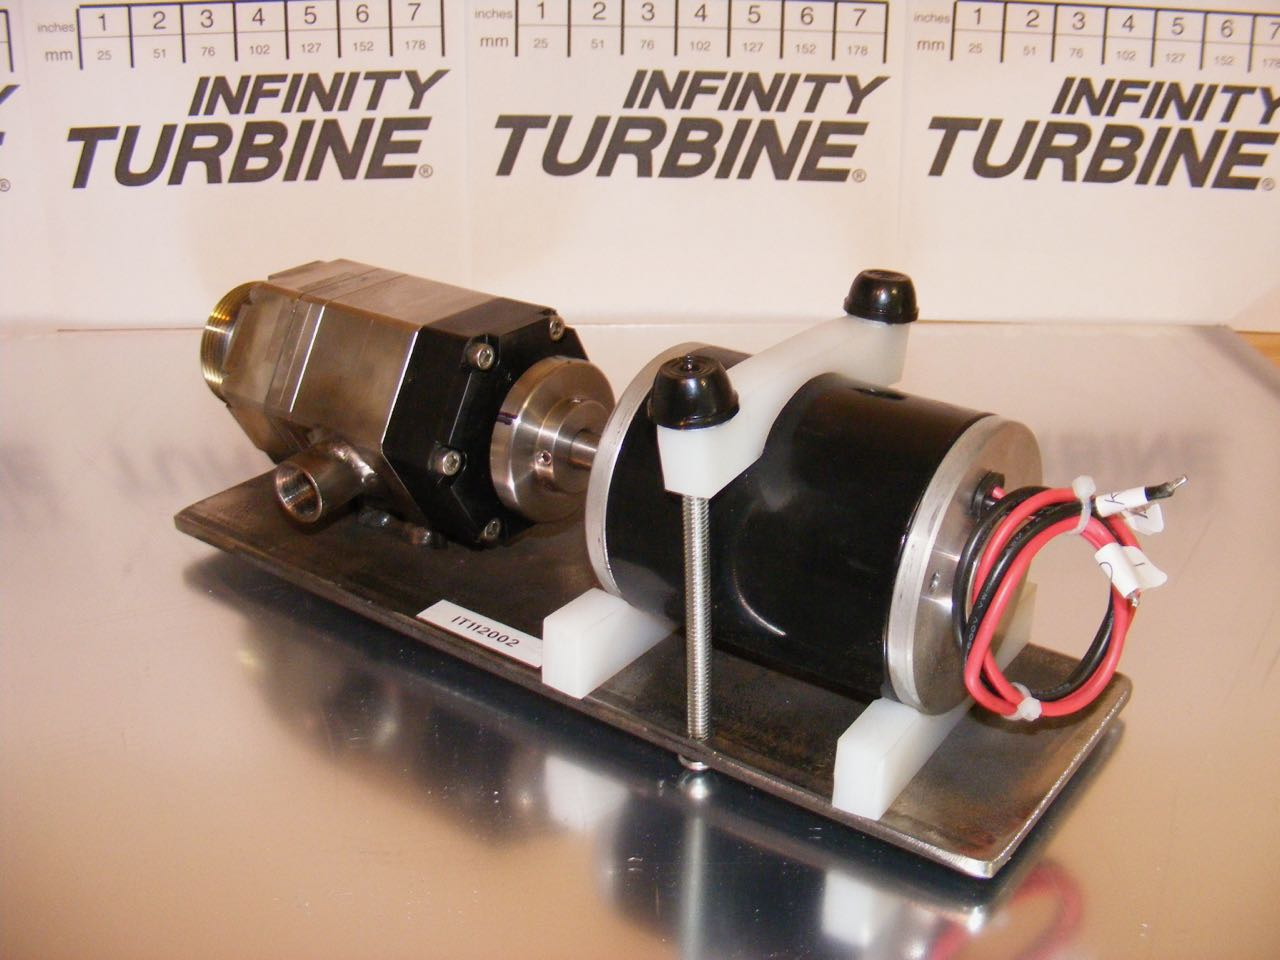 Infinity Turbine ITmini tubine generator with magnetic coupling